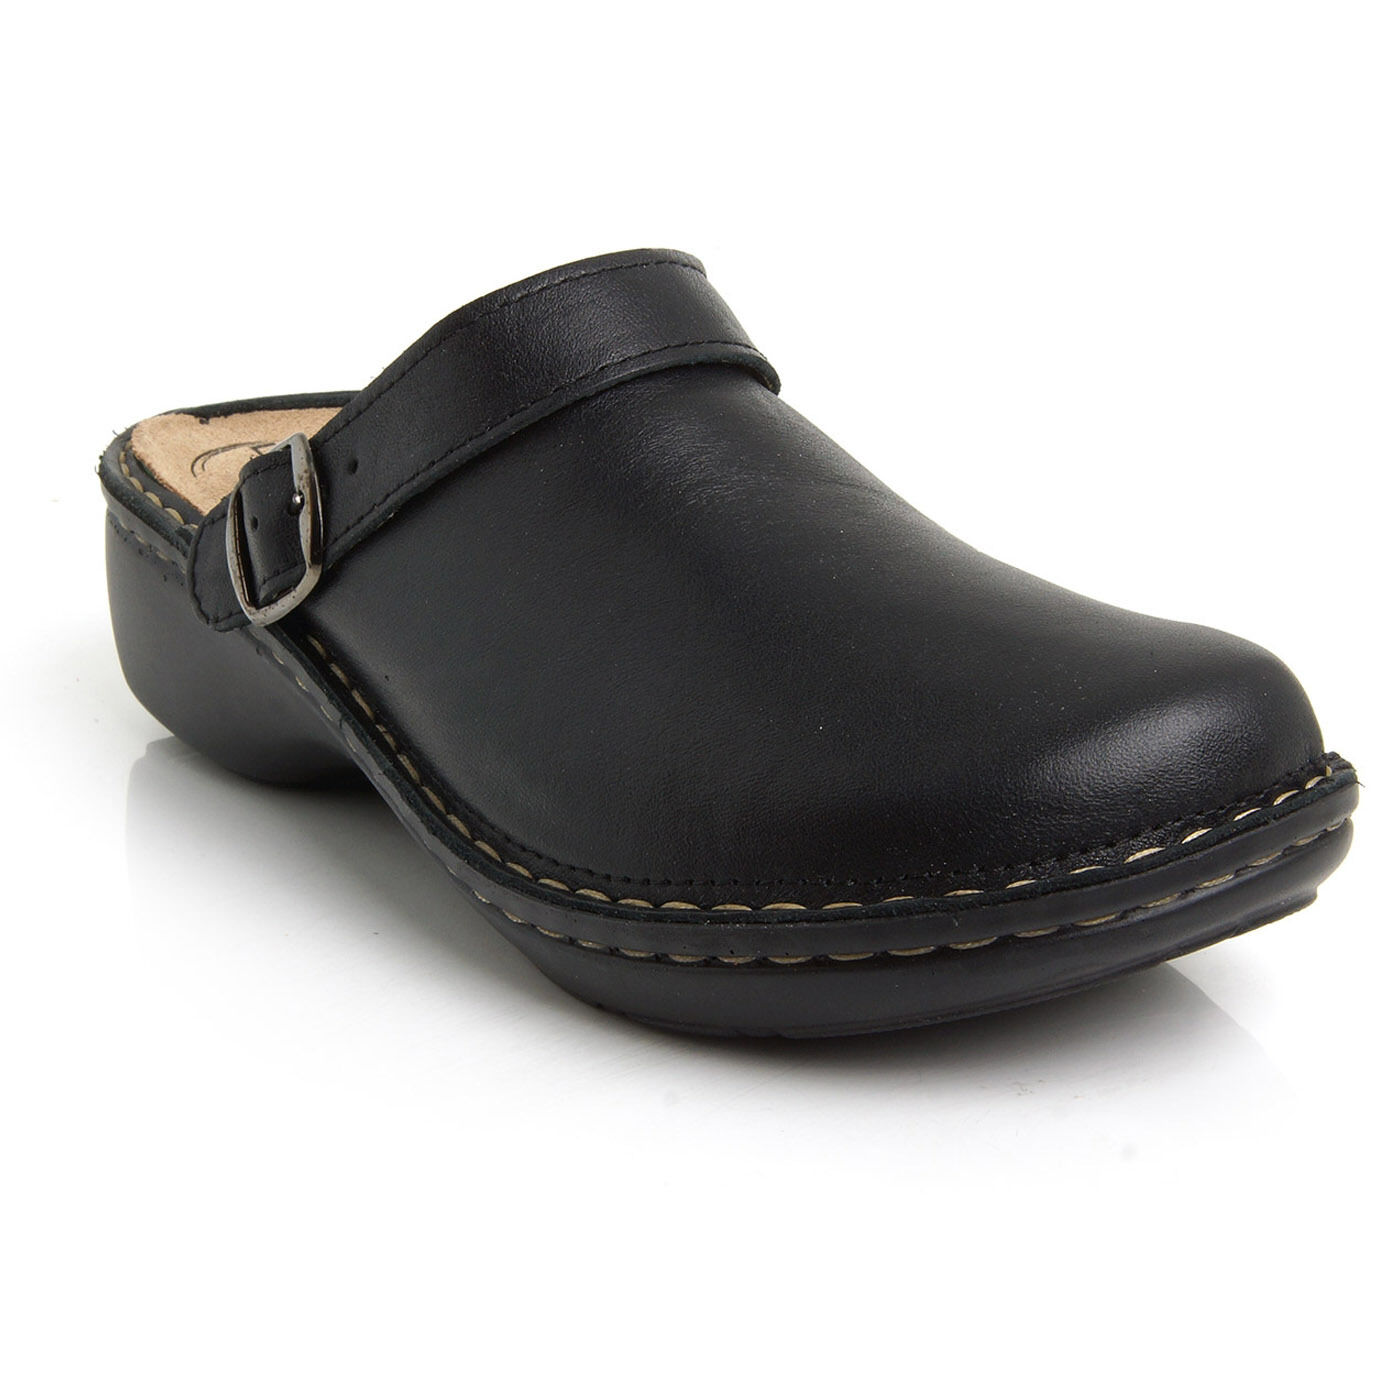 Batz mira 5-zonas Negro de cuero para mujer Slip On Mulas Zuecos Sandalias zapatos nuevo Reino Unido